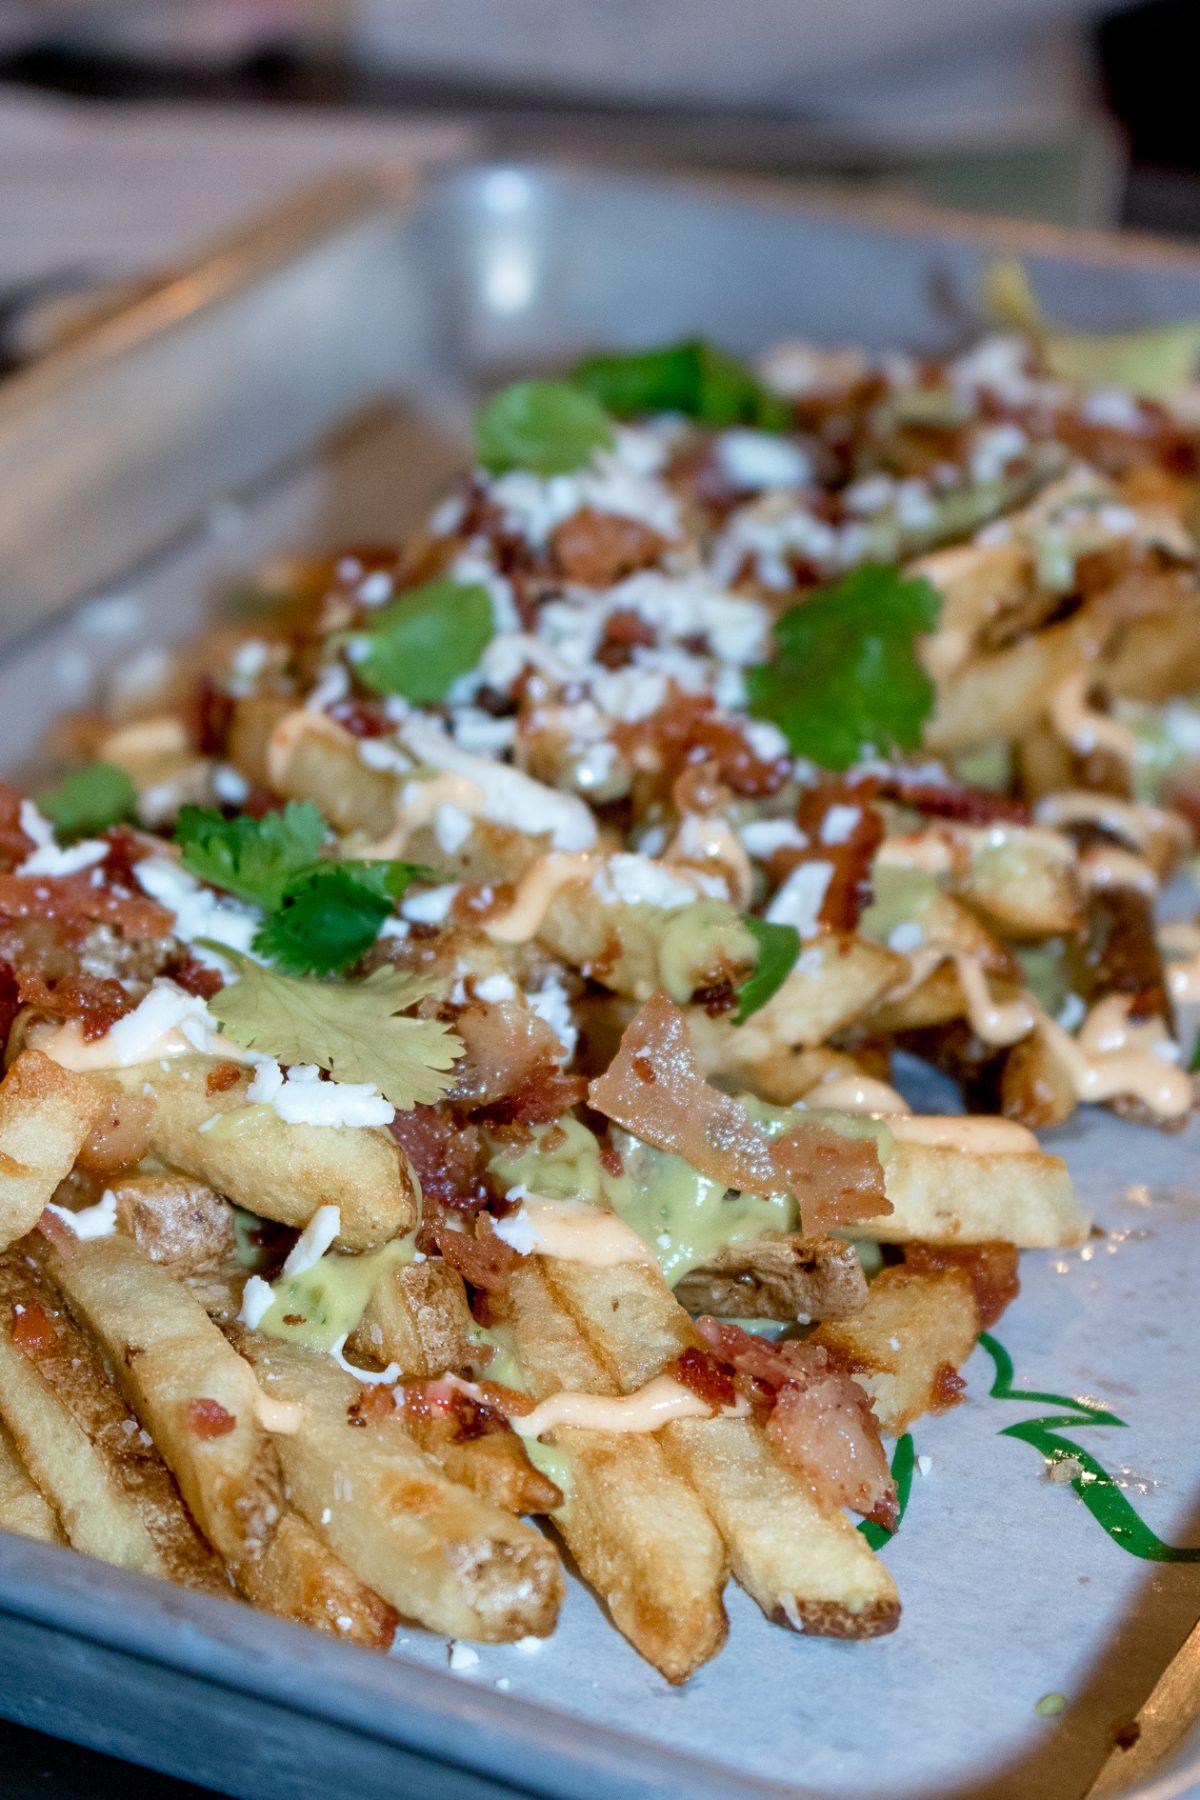 STREET FRIES - Hand Cuts, Tomatillo Guac, Chipotle Aioli, Bacon, Cotija, Cilantro at Roost in Hamden CT